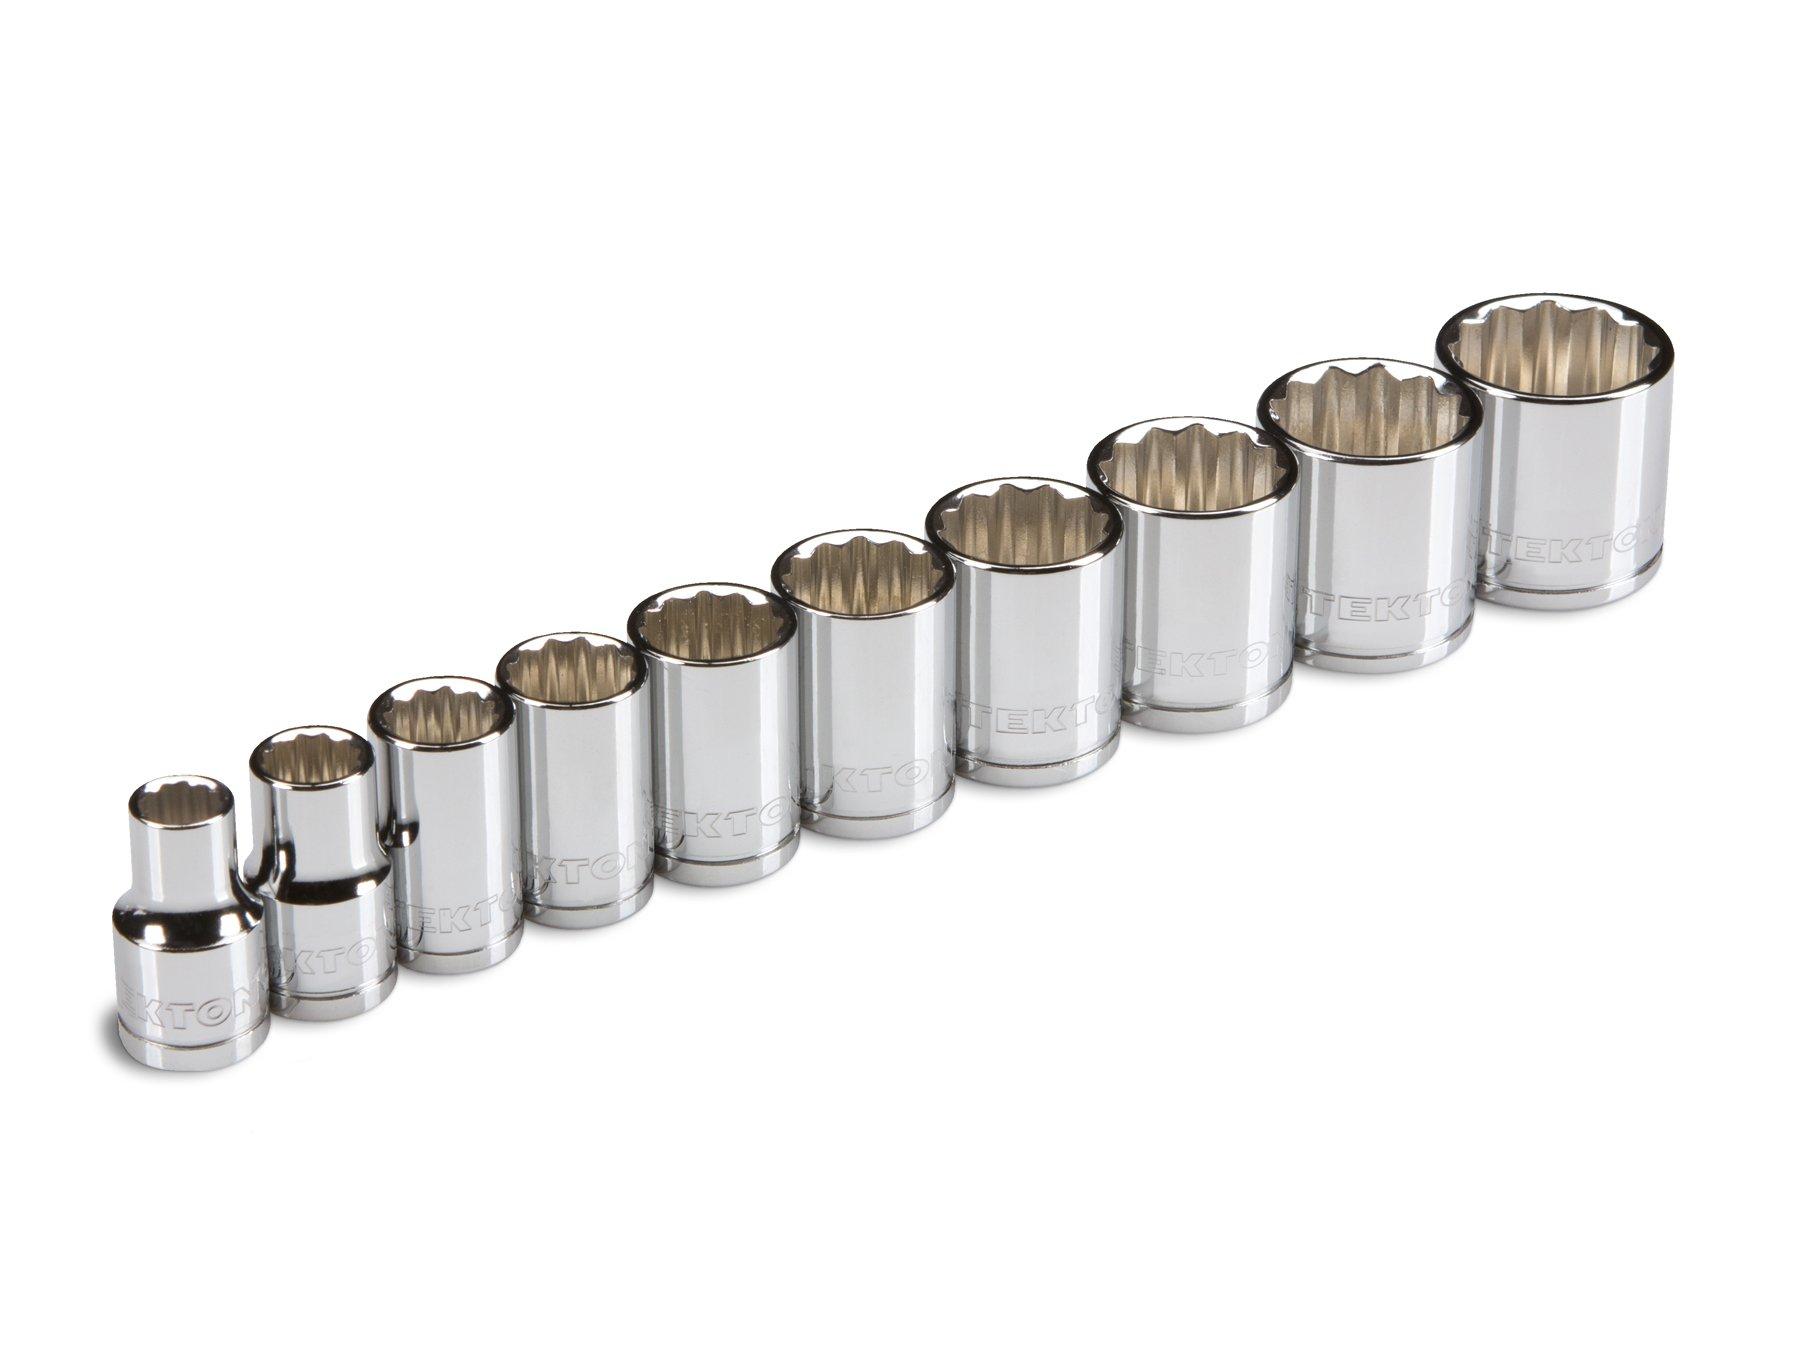 TEKTON 3/8-Inch Drive Socket Set, Inch, Cr-V, 5/16-Inch - 7/8-Inch, 10-Sockets | 1203